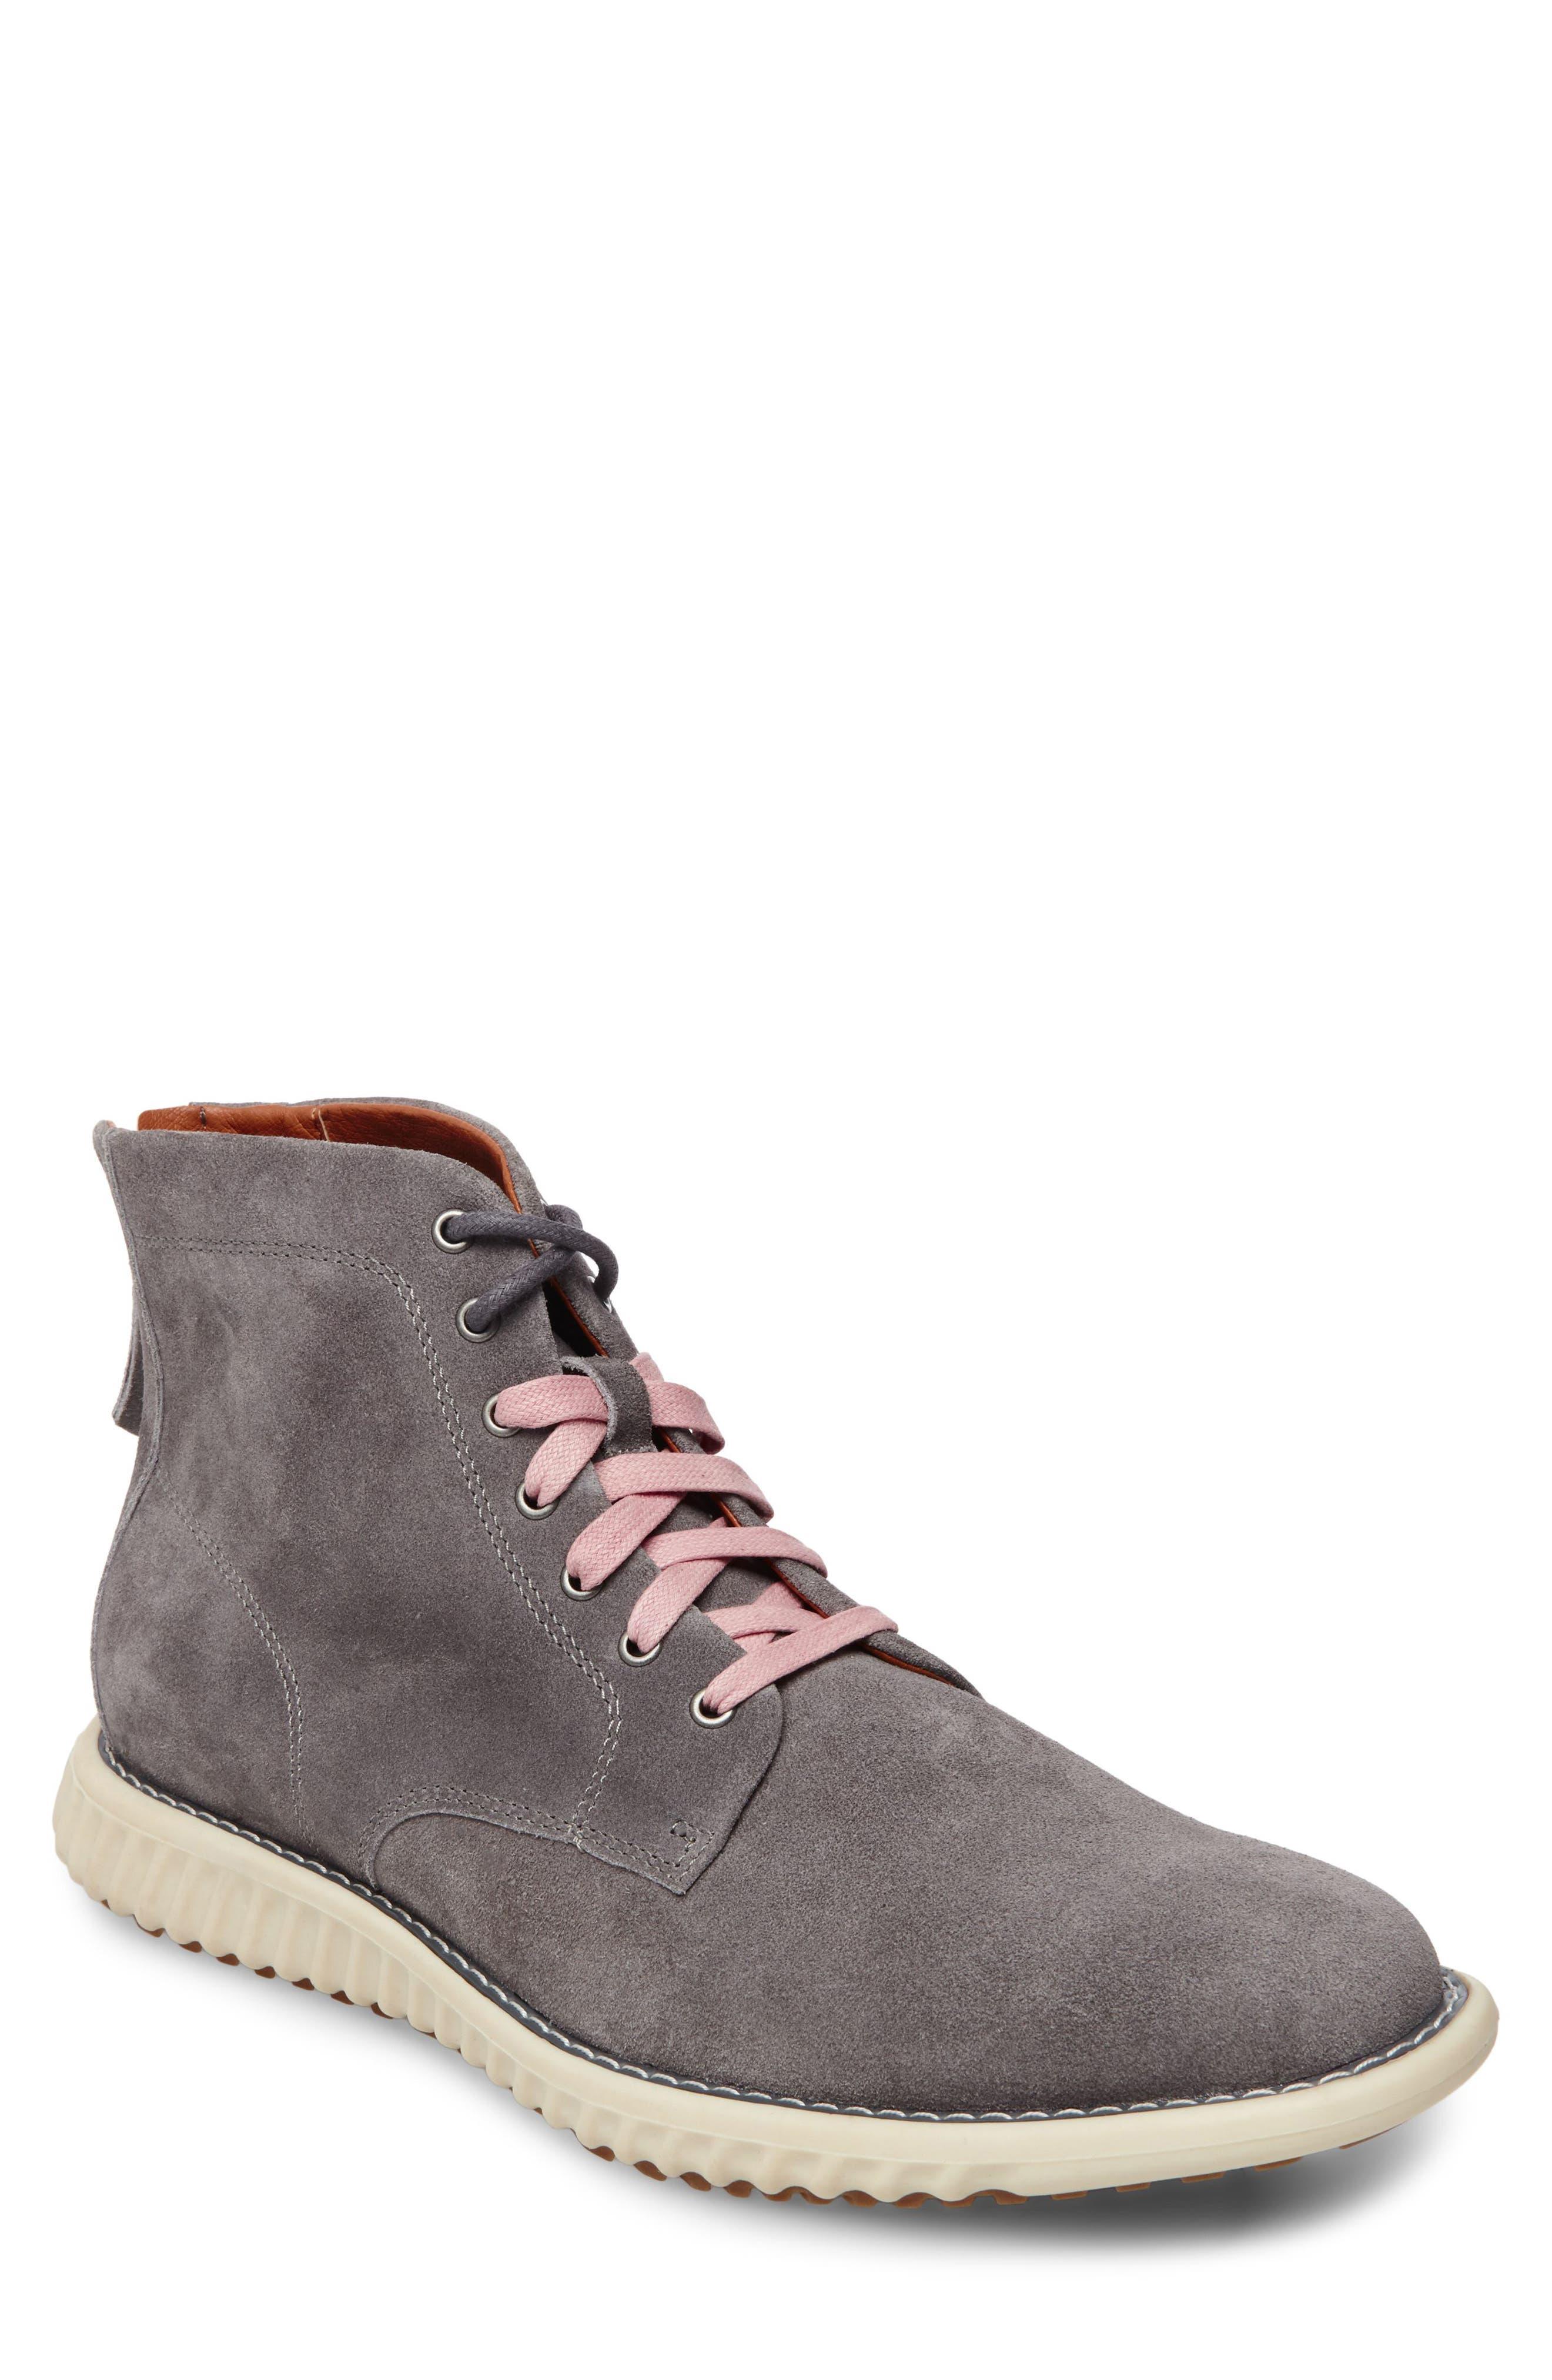 Verner Suede Plain Toe Boot,                         Main,                         color, 074